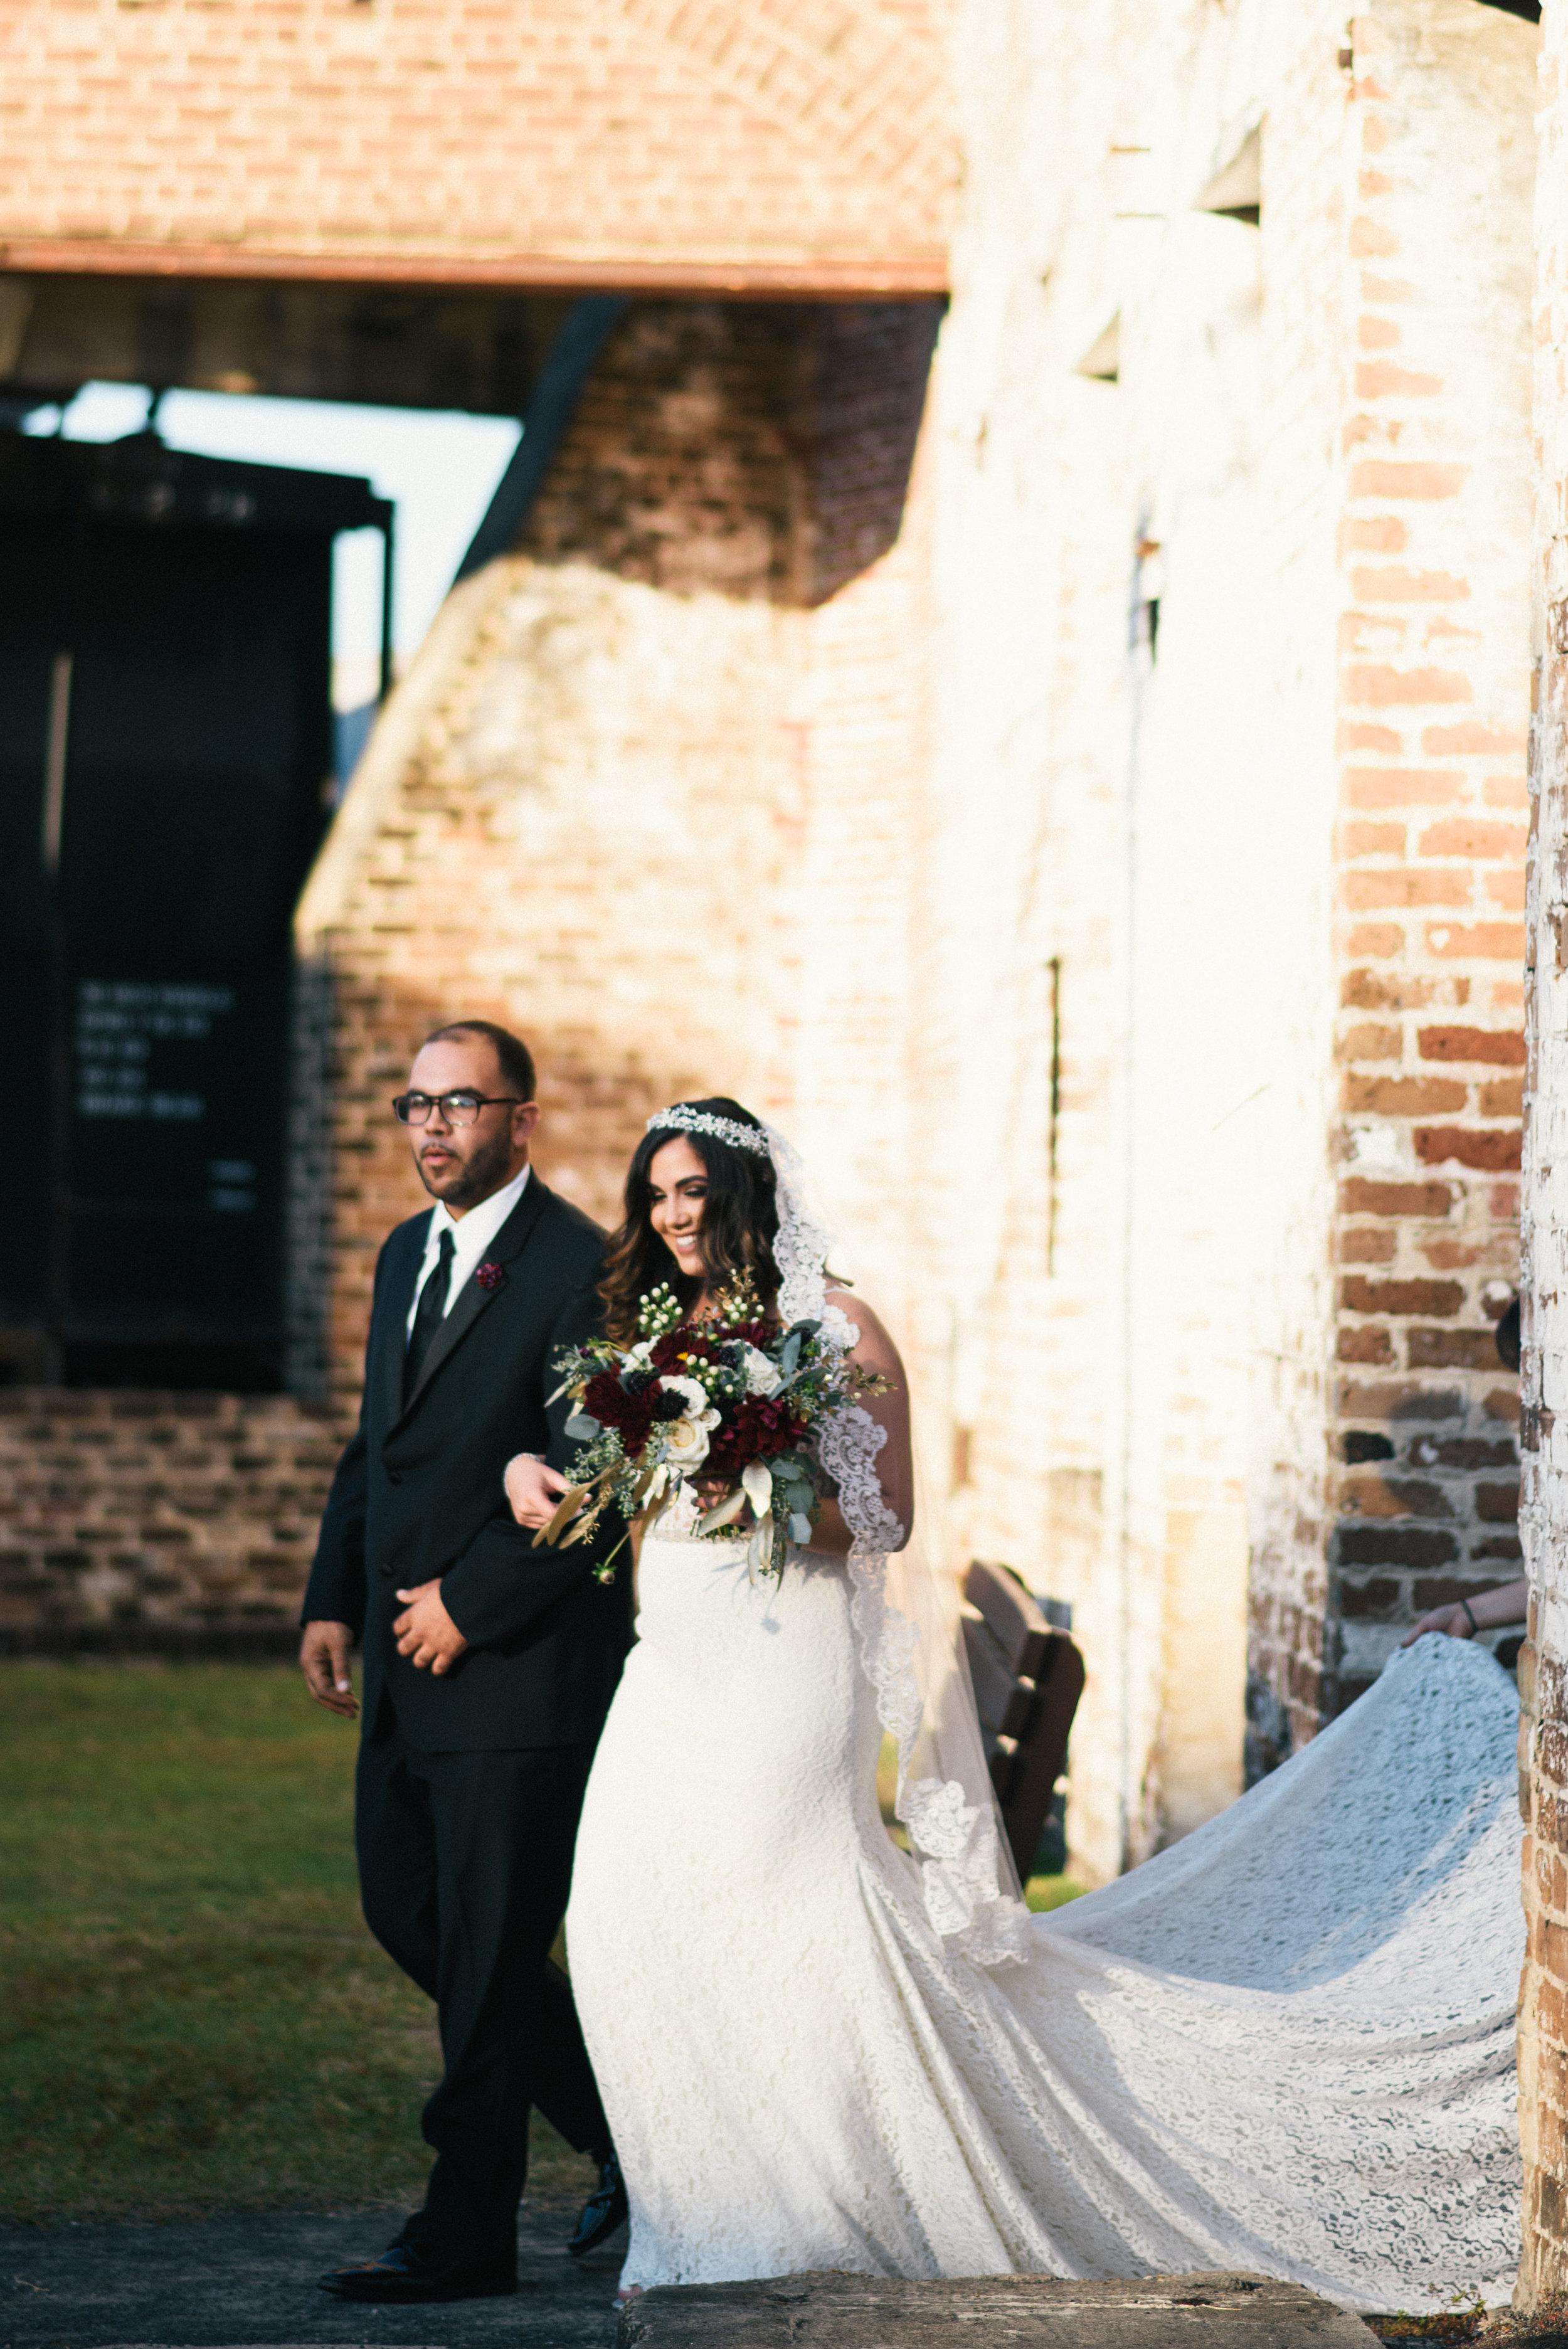 Iggy-and-yesenia-savannah-railroad-museum-wedding-meg-hill-photo- (442 of 1037).jpg